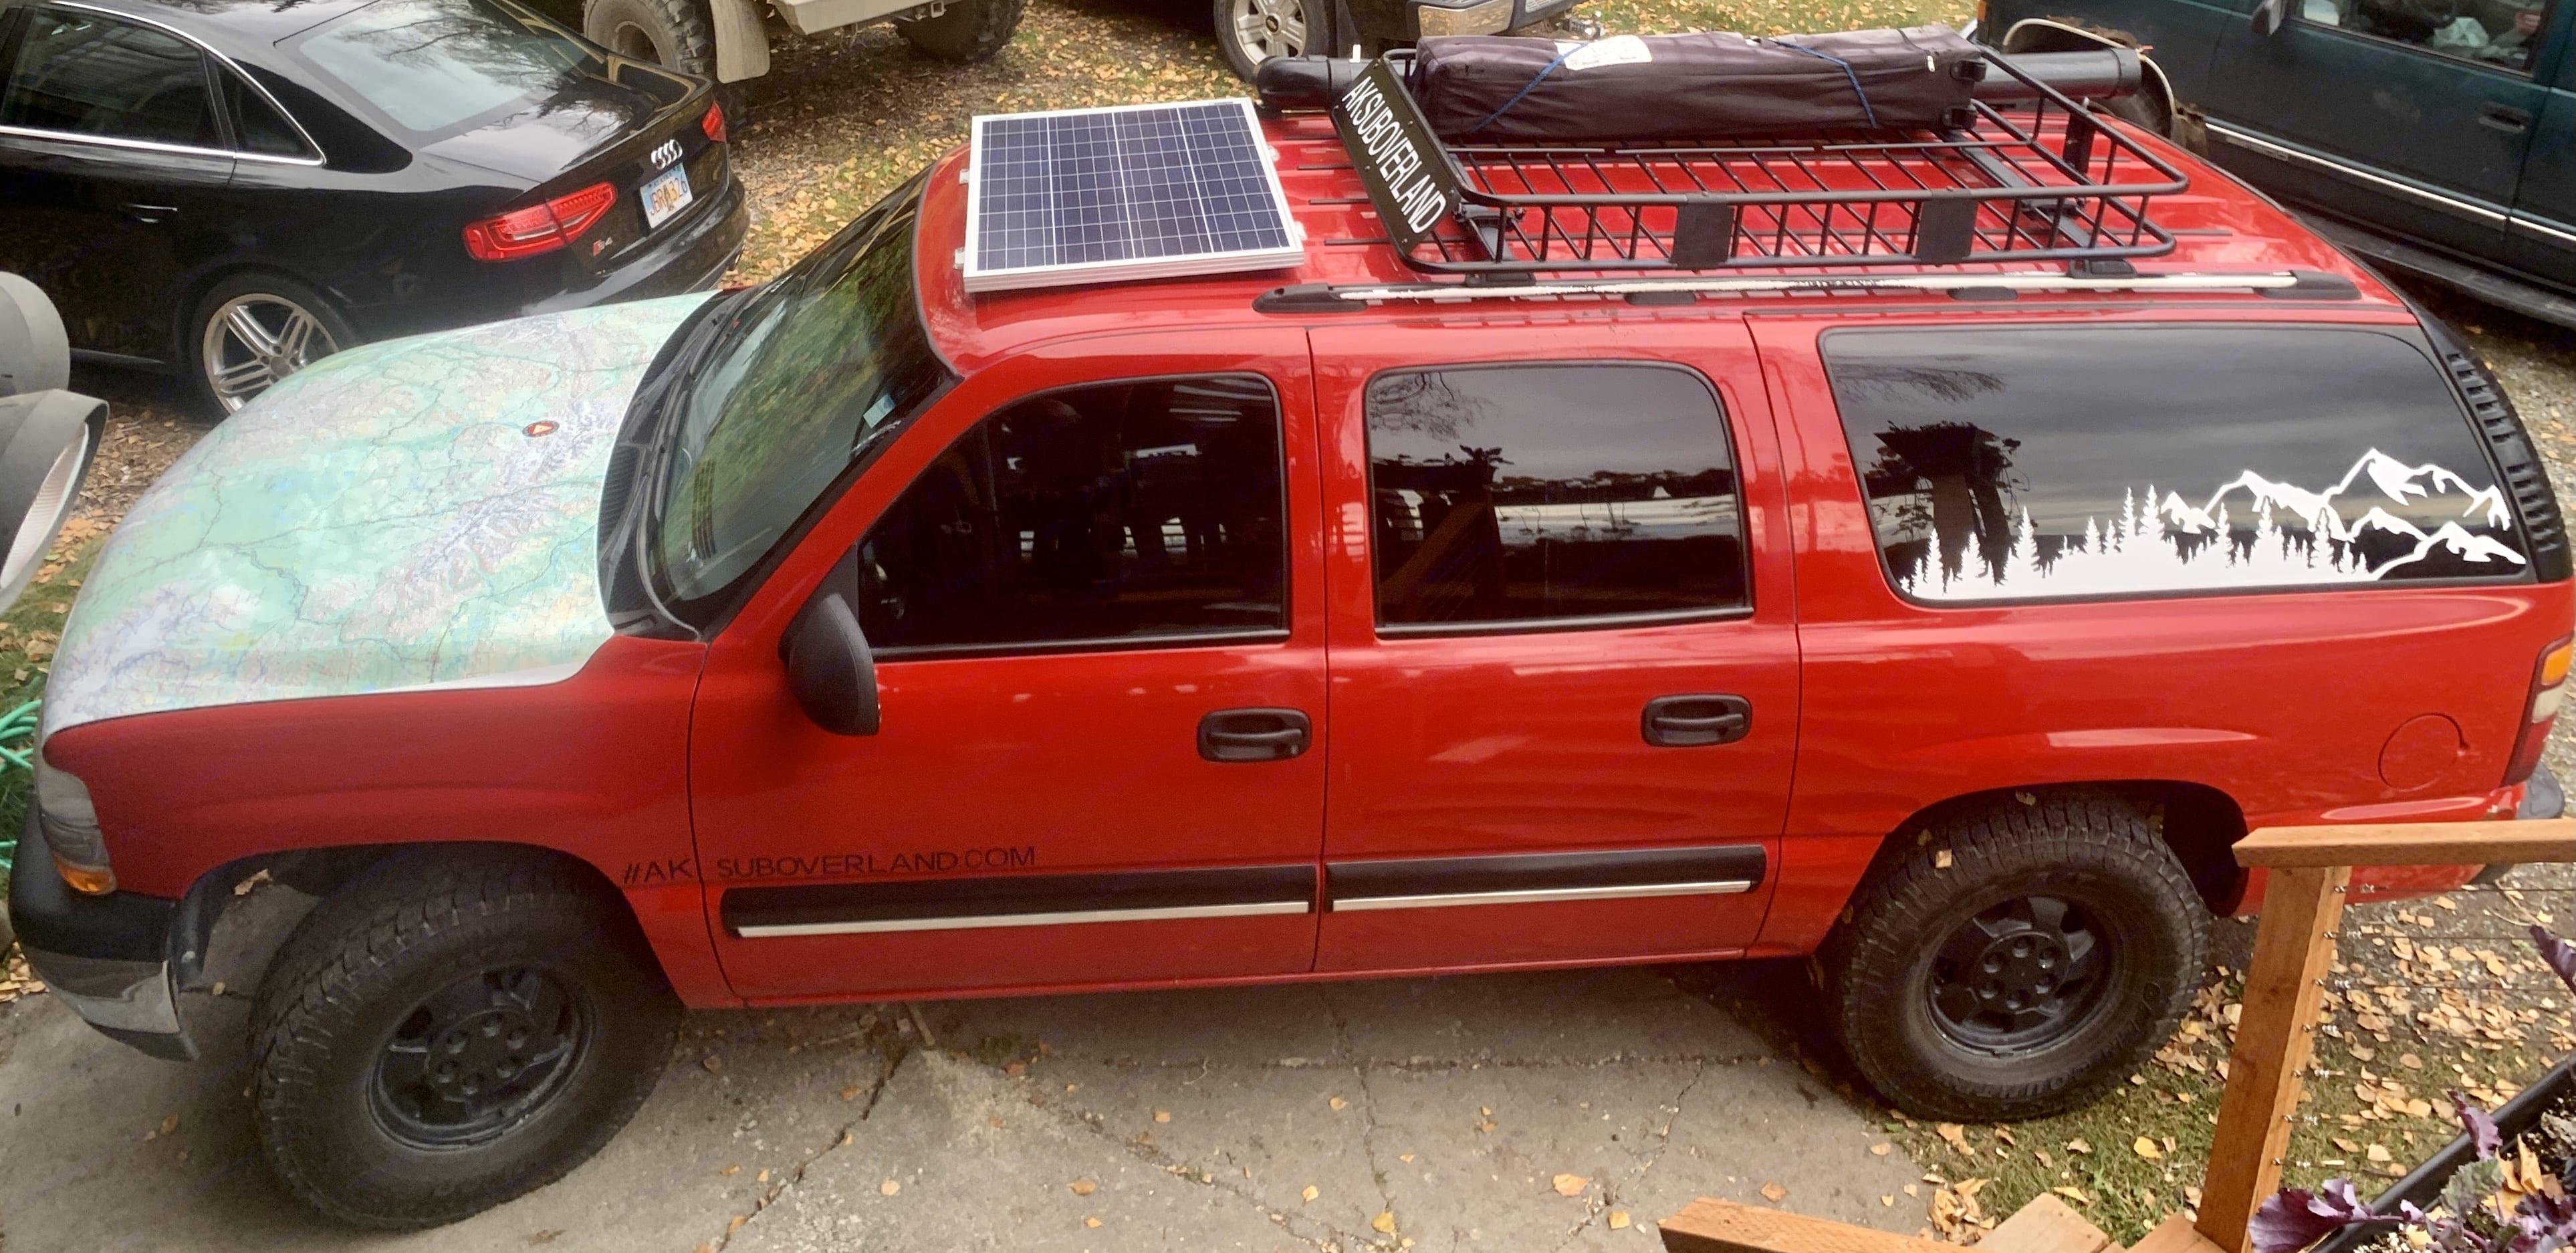 Chevrolet Suburban Overland 2000